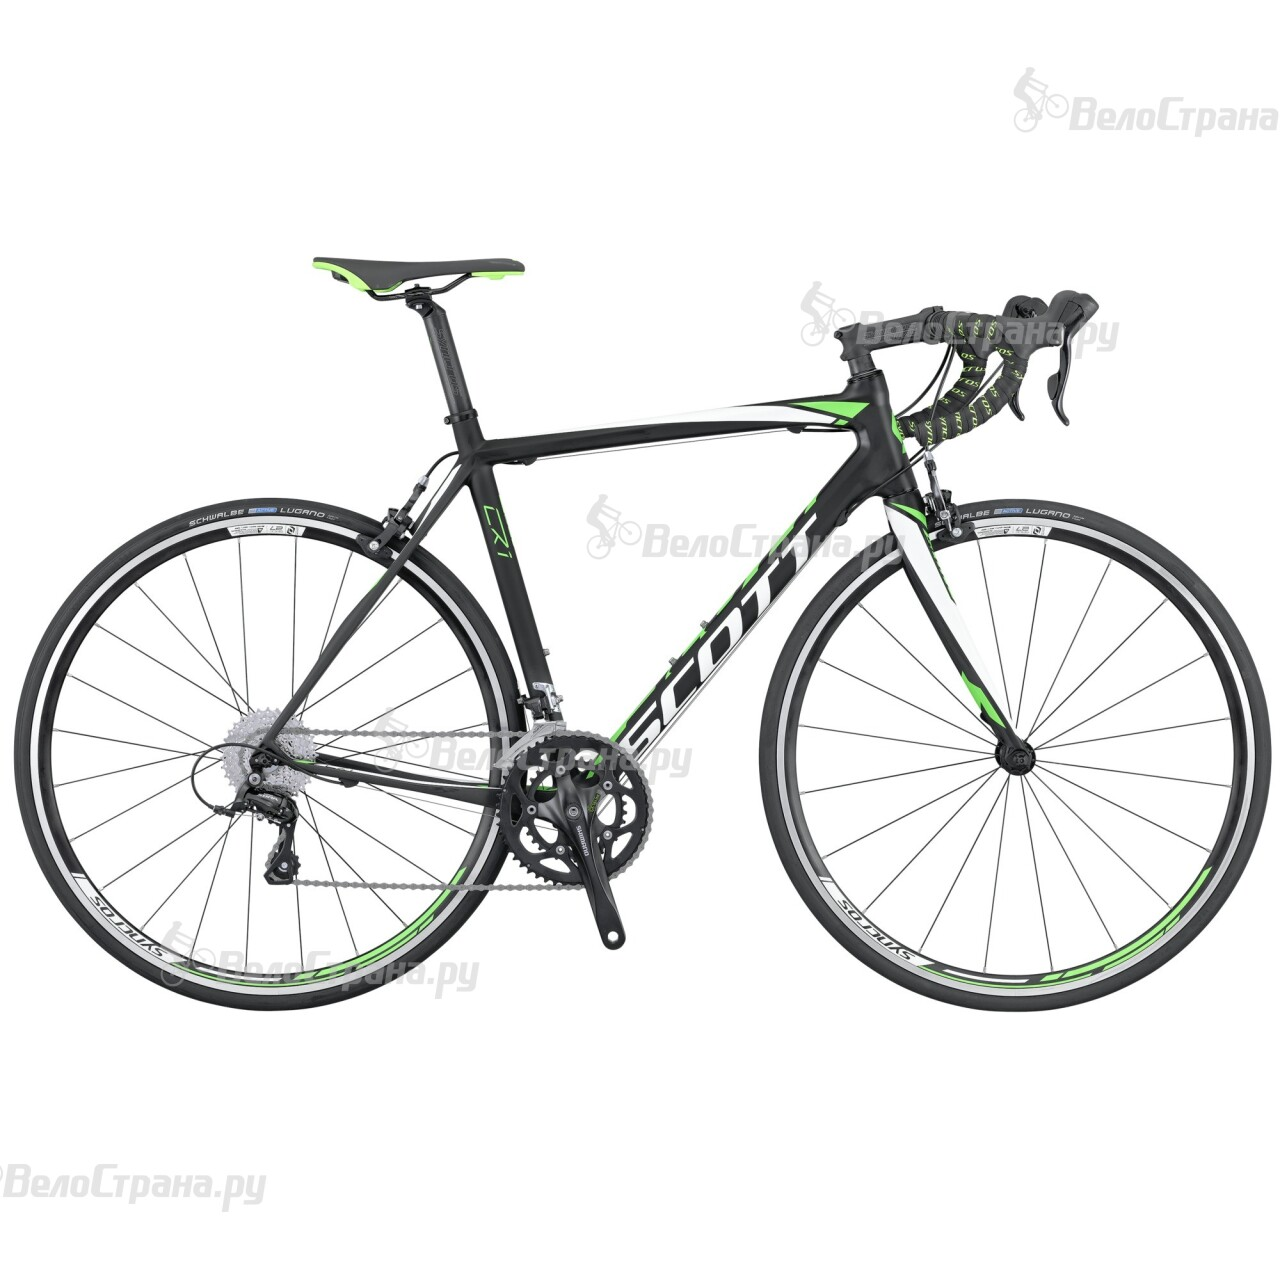 Велосипед Scott CR1 30 (2016) прочие устройства sonance cr1